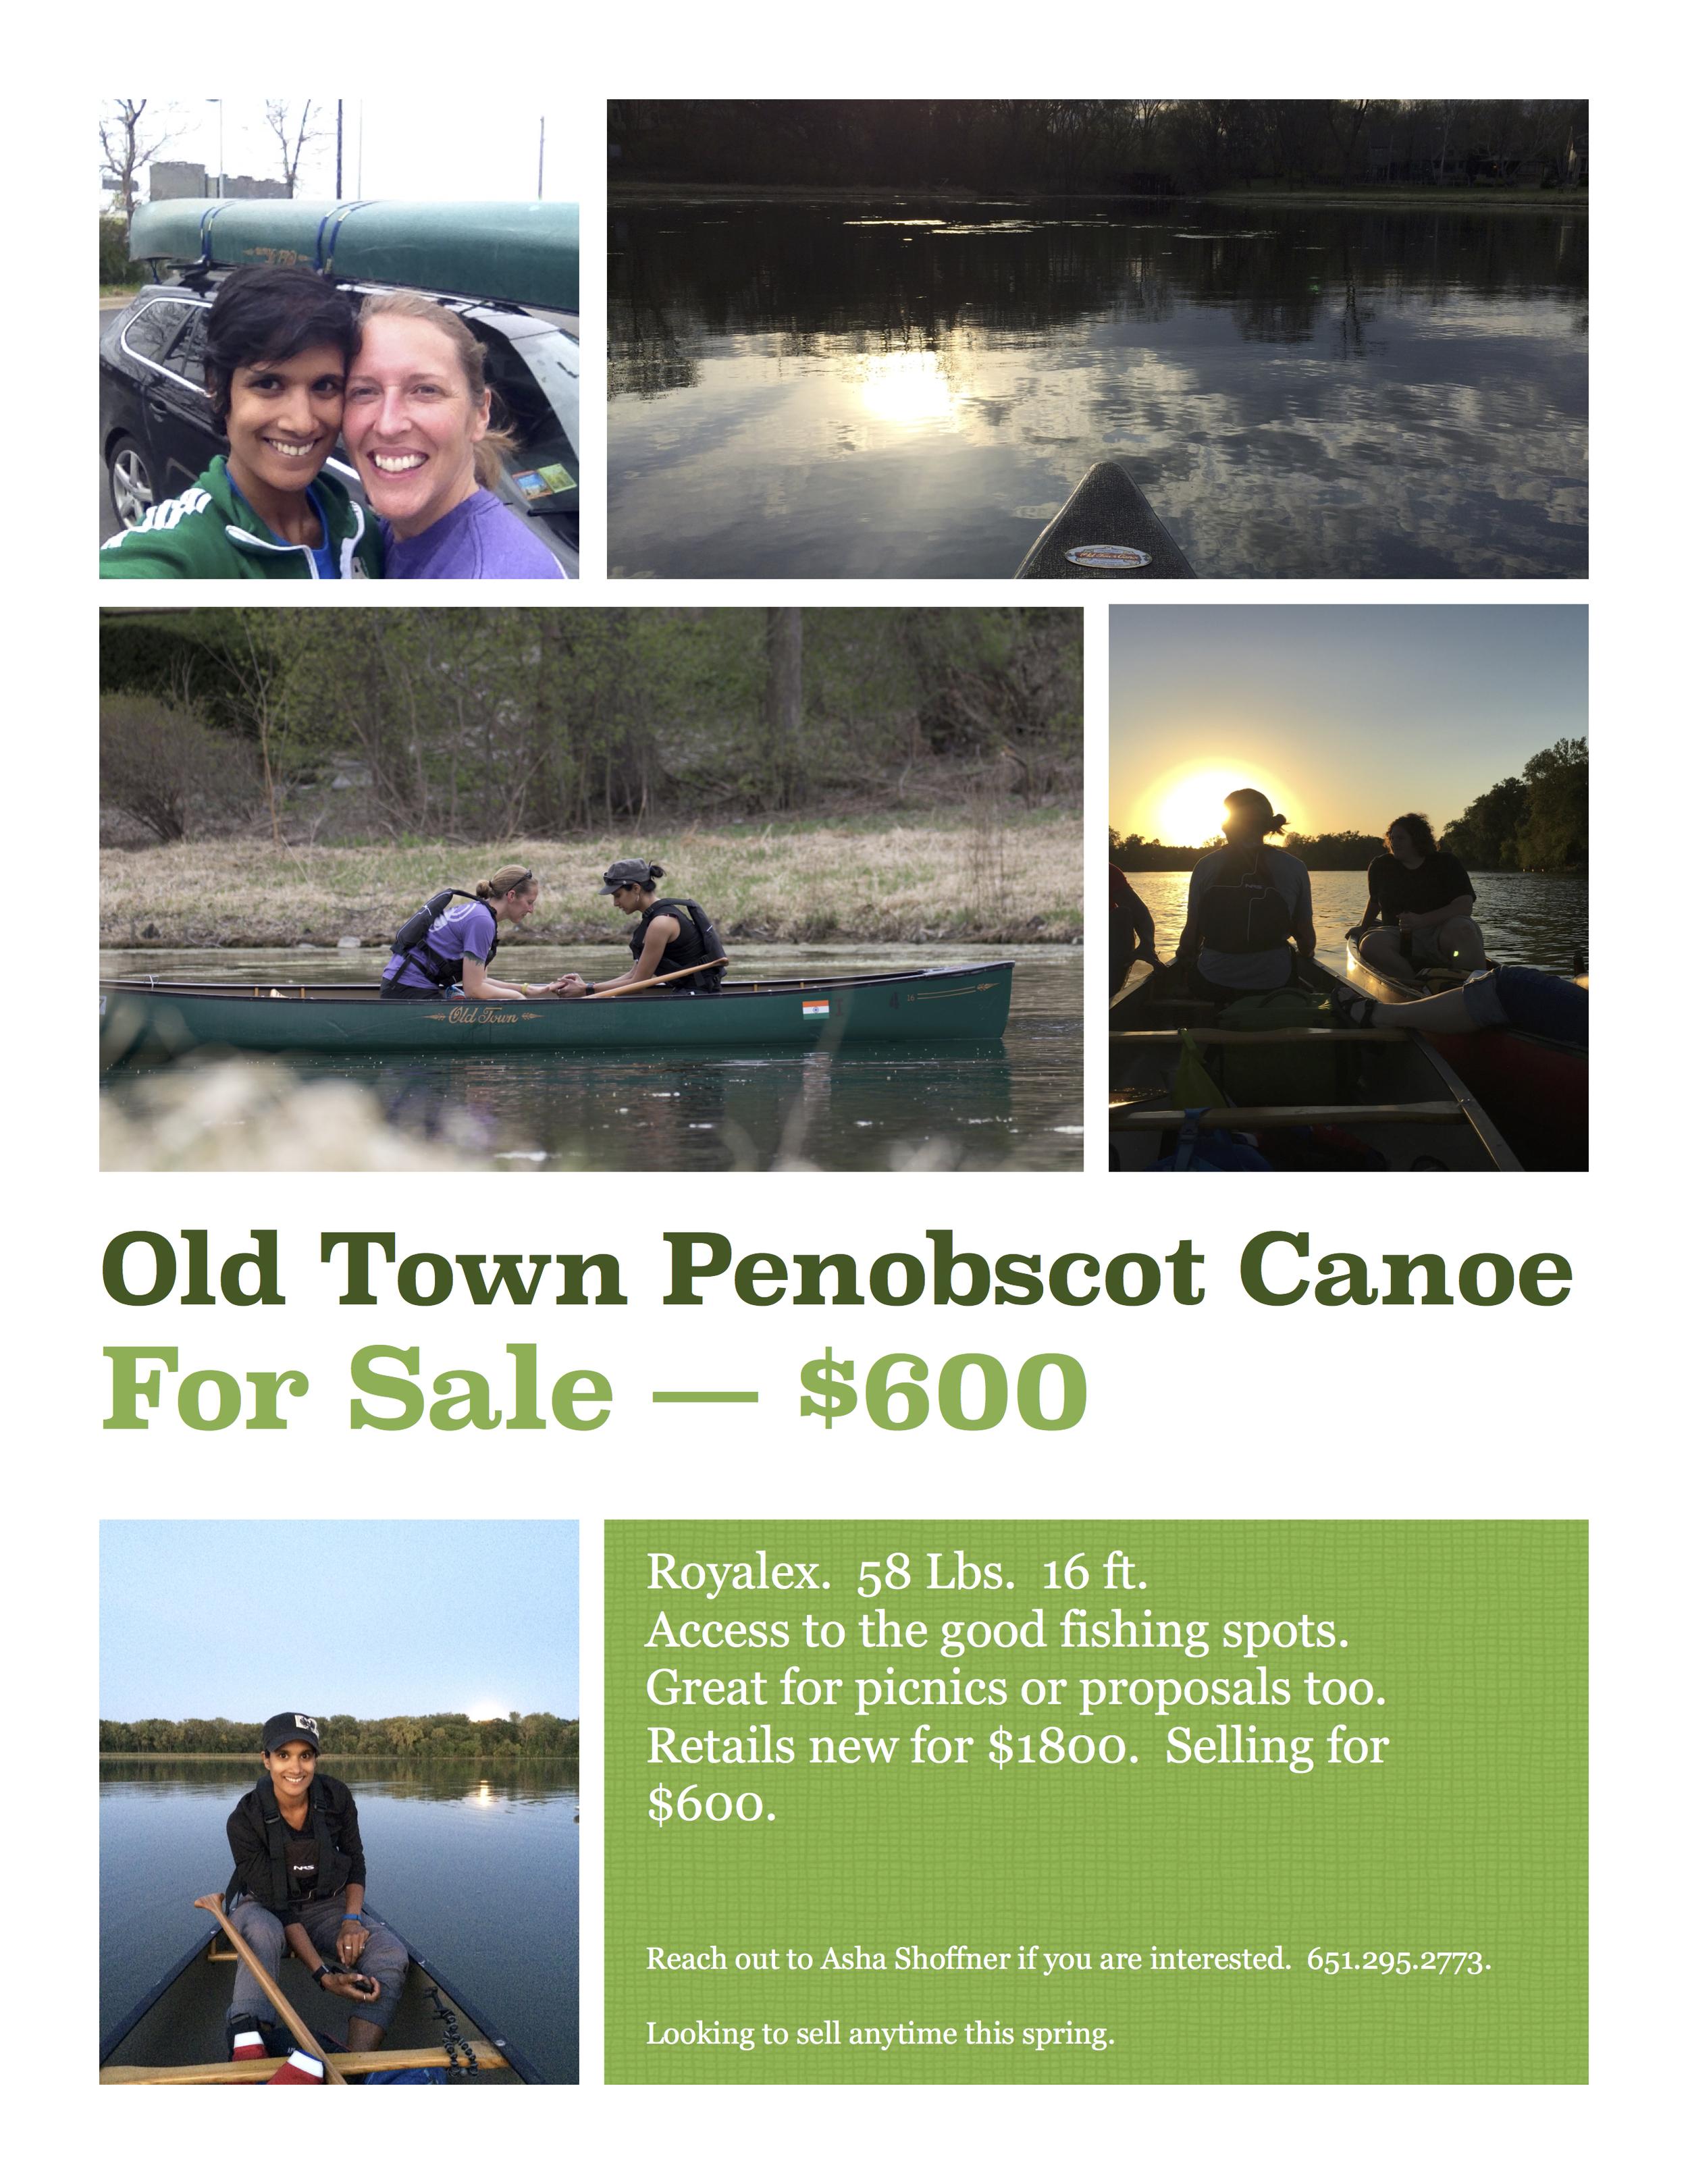 Canoe_For_Sale